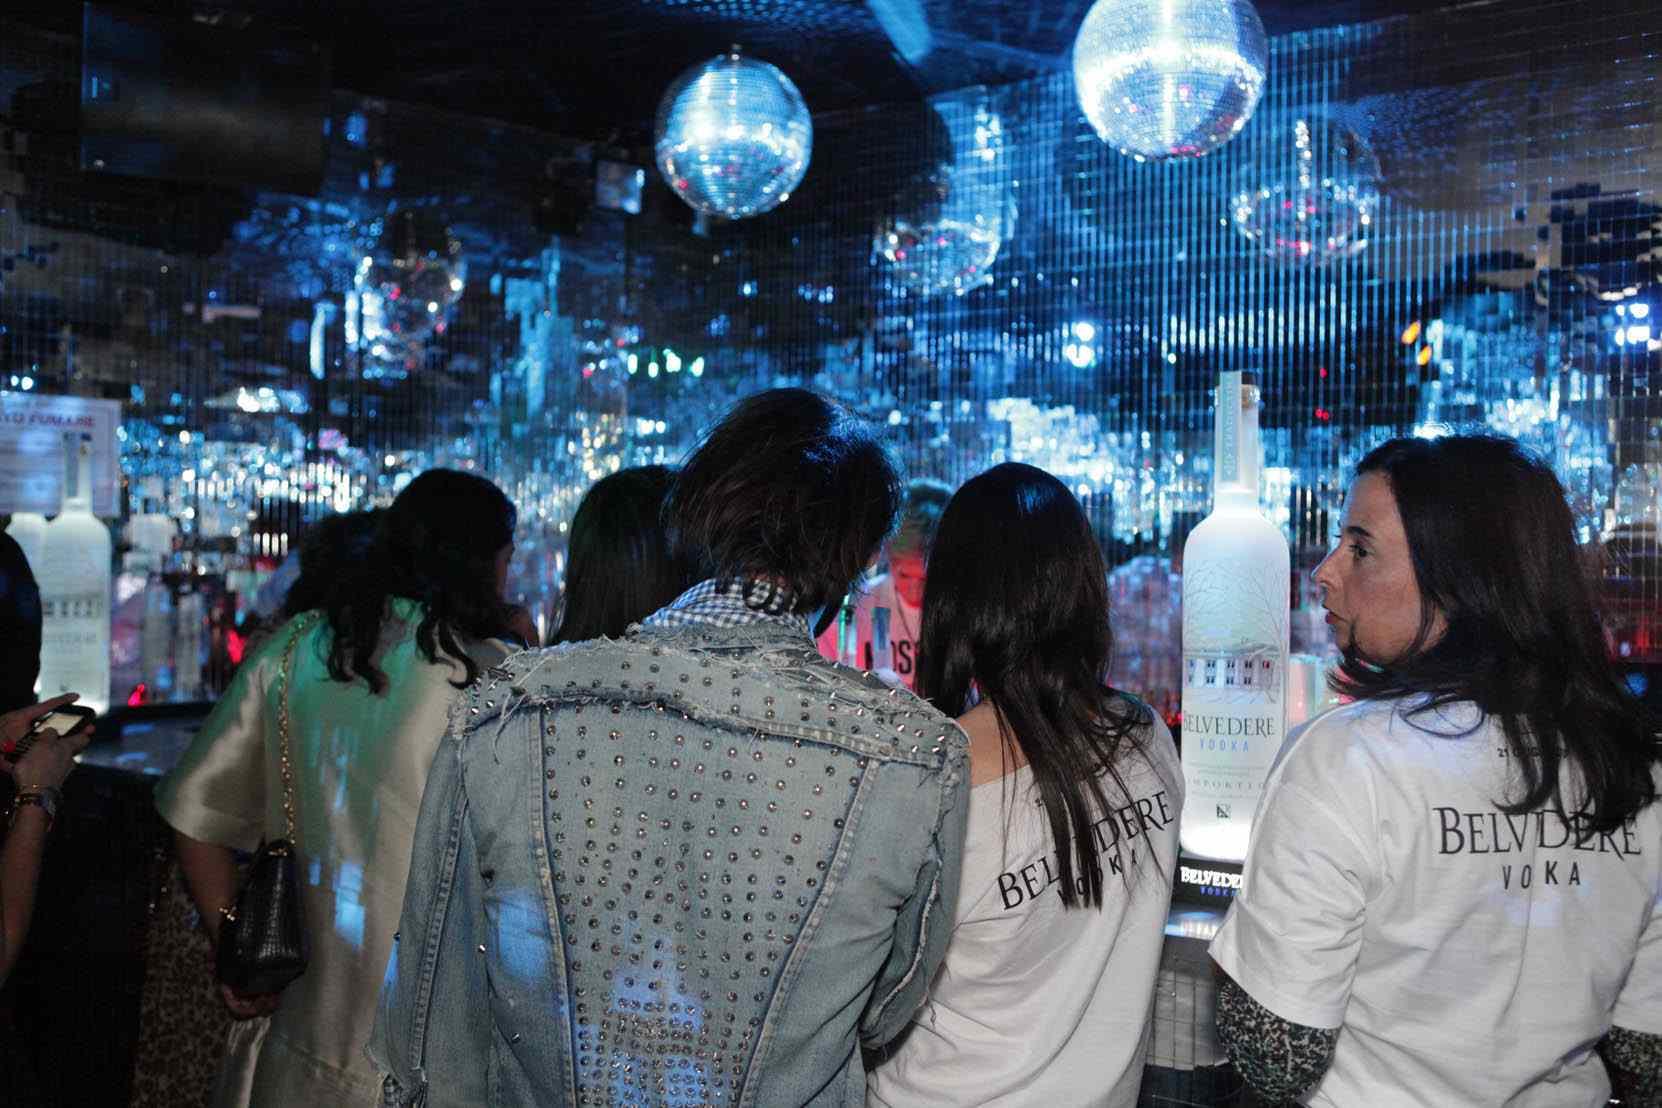 Moschino loves belvedere vodka party plastic milan - Specchi riflessi karaoke ...